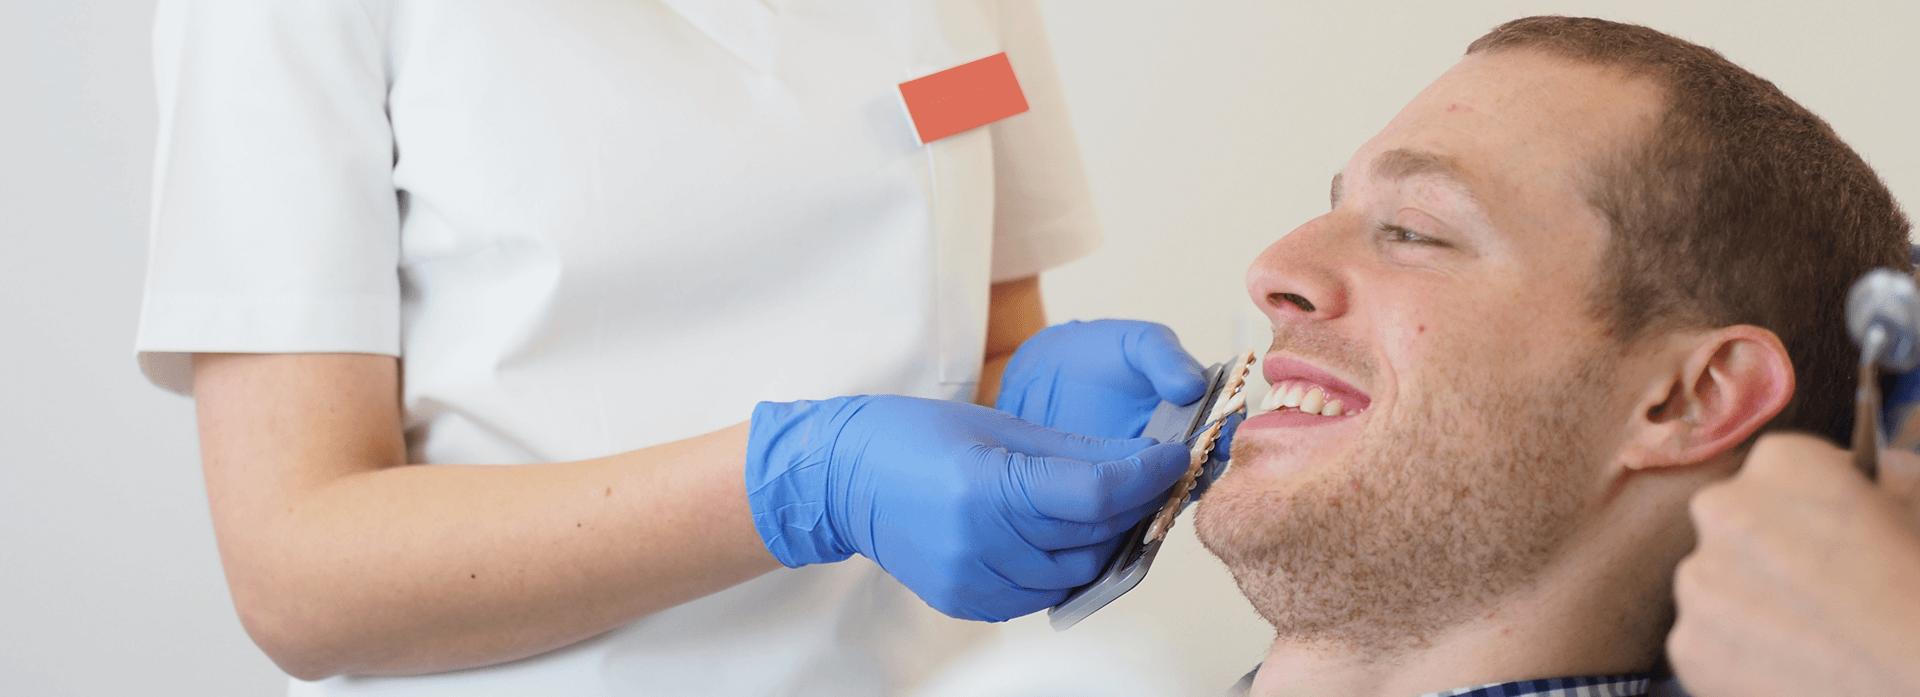 Ljuskice za zube - Veneers | Cijena | Štimac Centar dentalne medicine